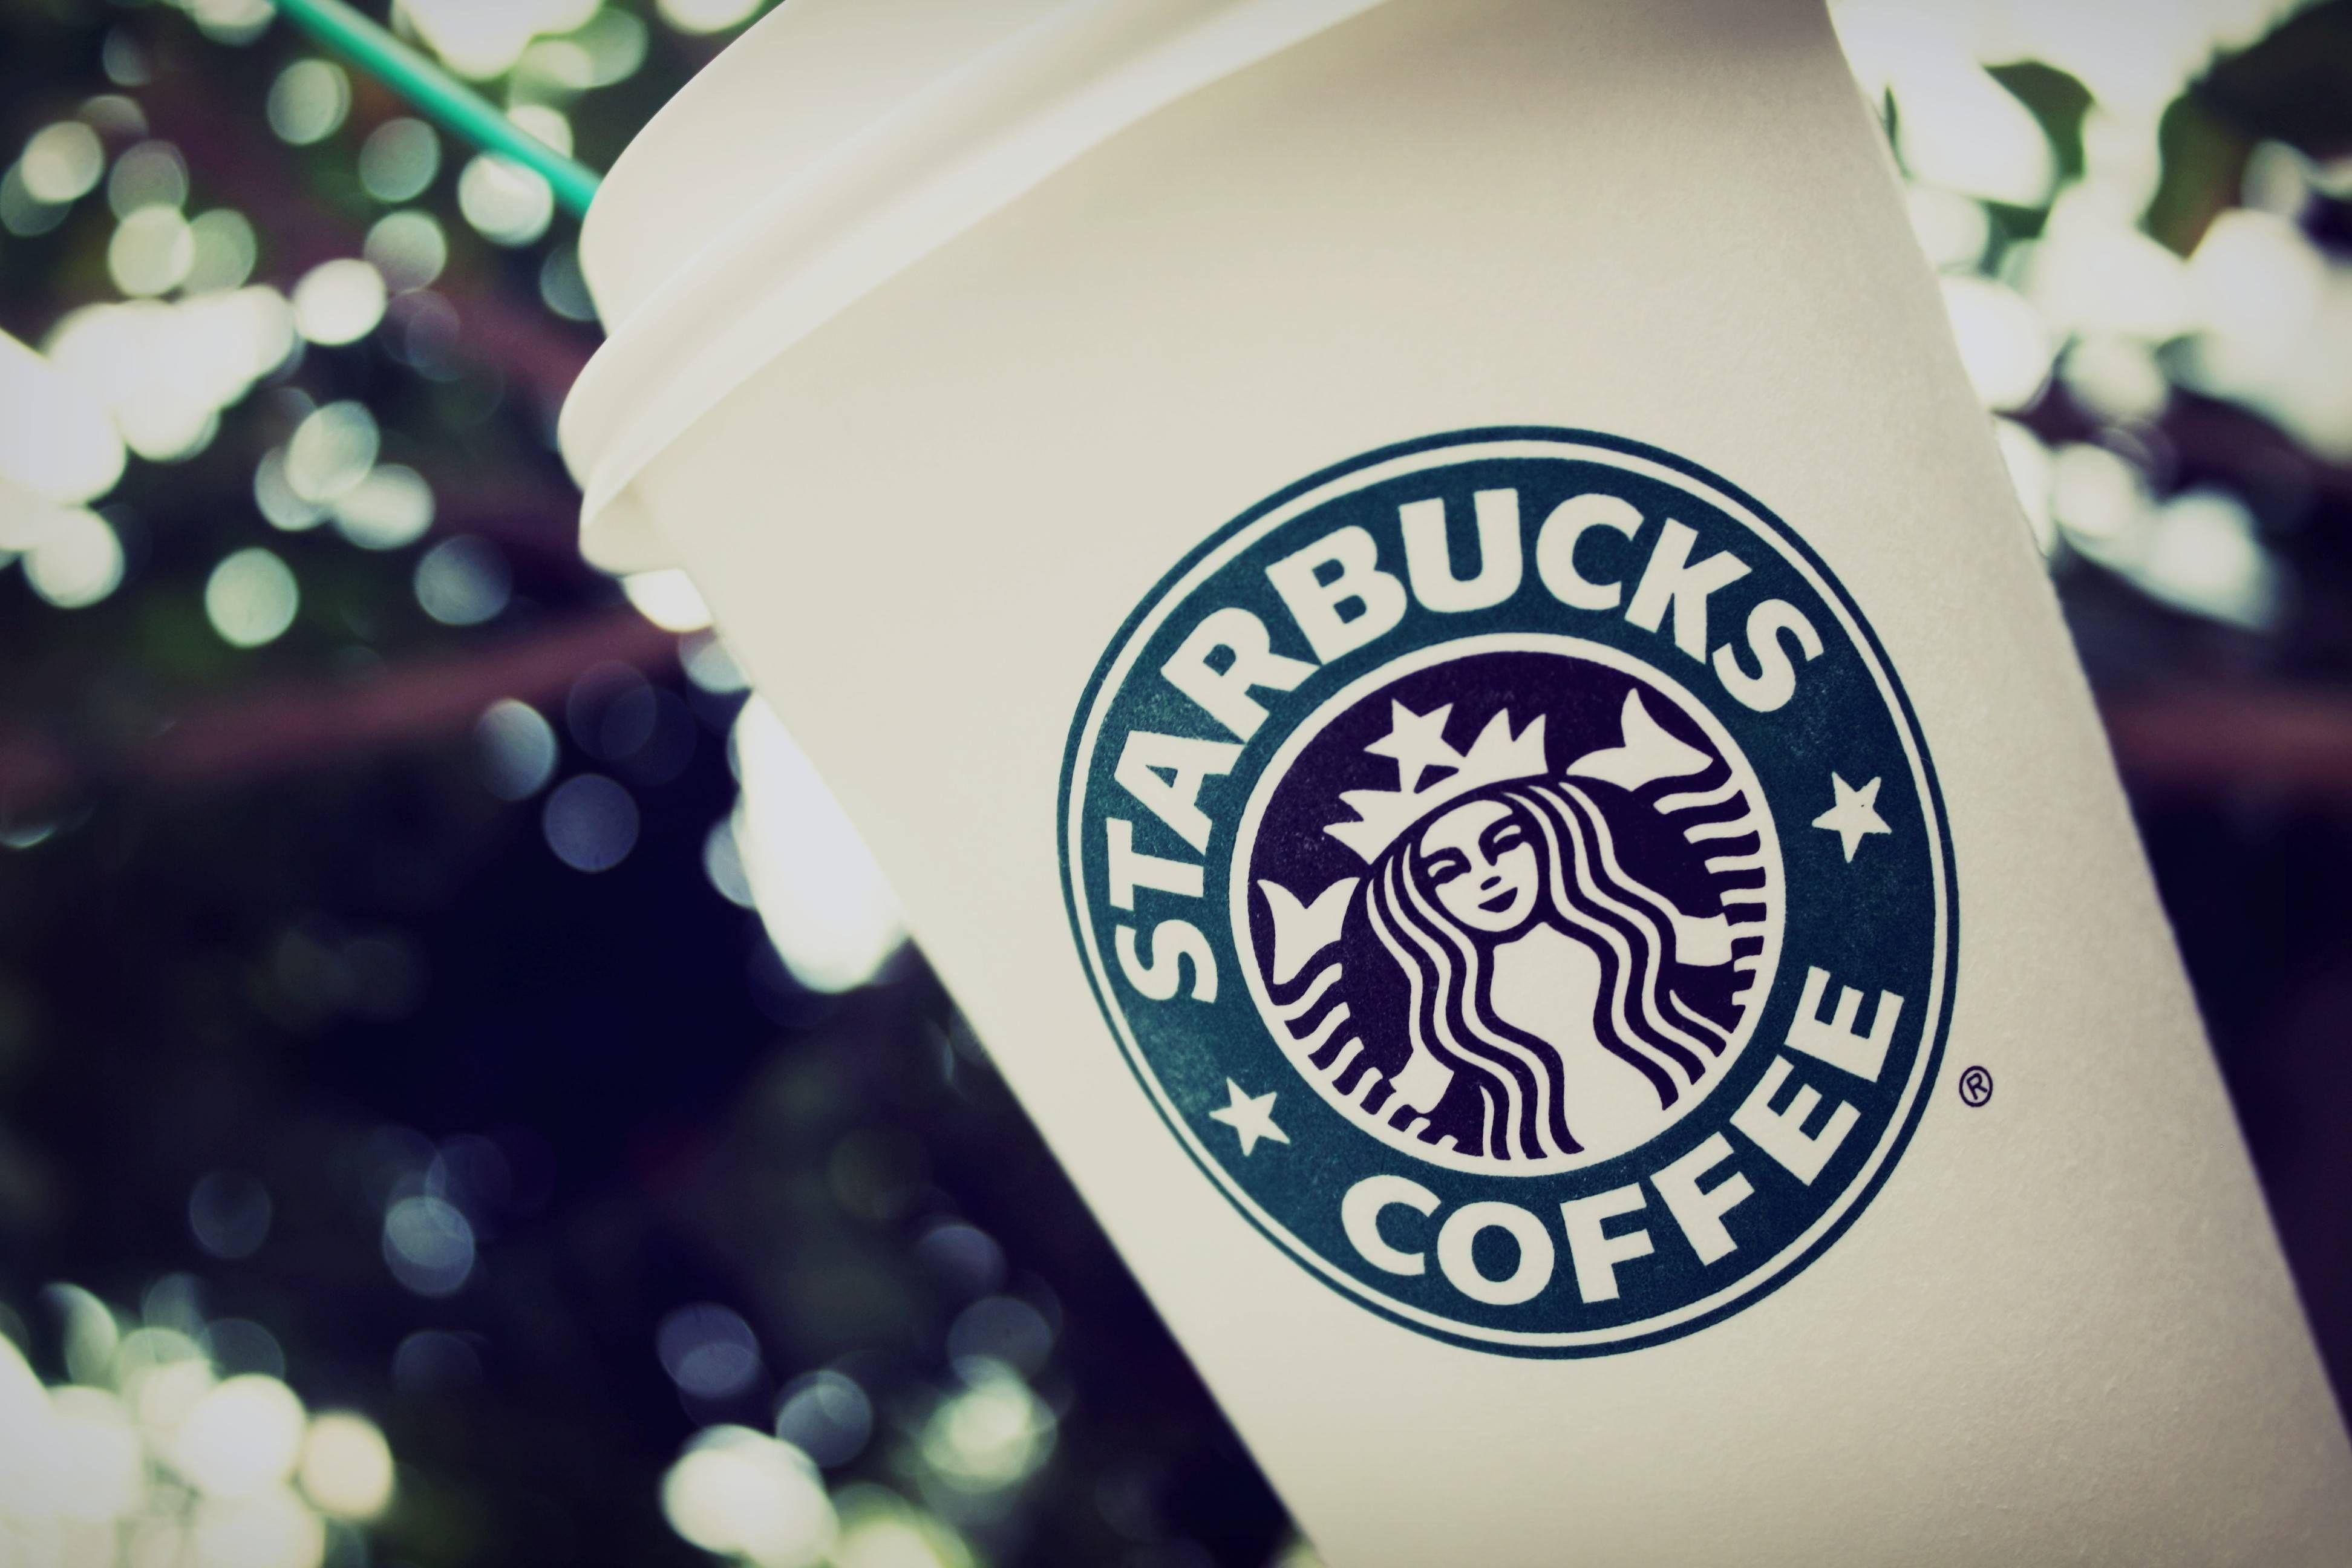 Fonds d'écran Starbucks tous les wallpapers Starbucks